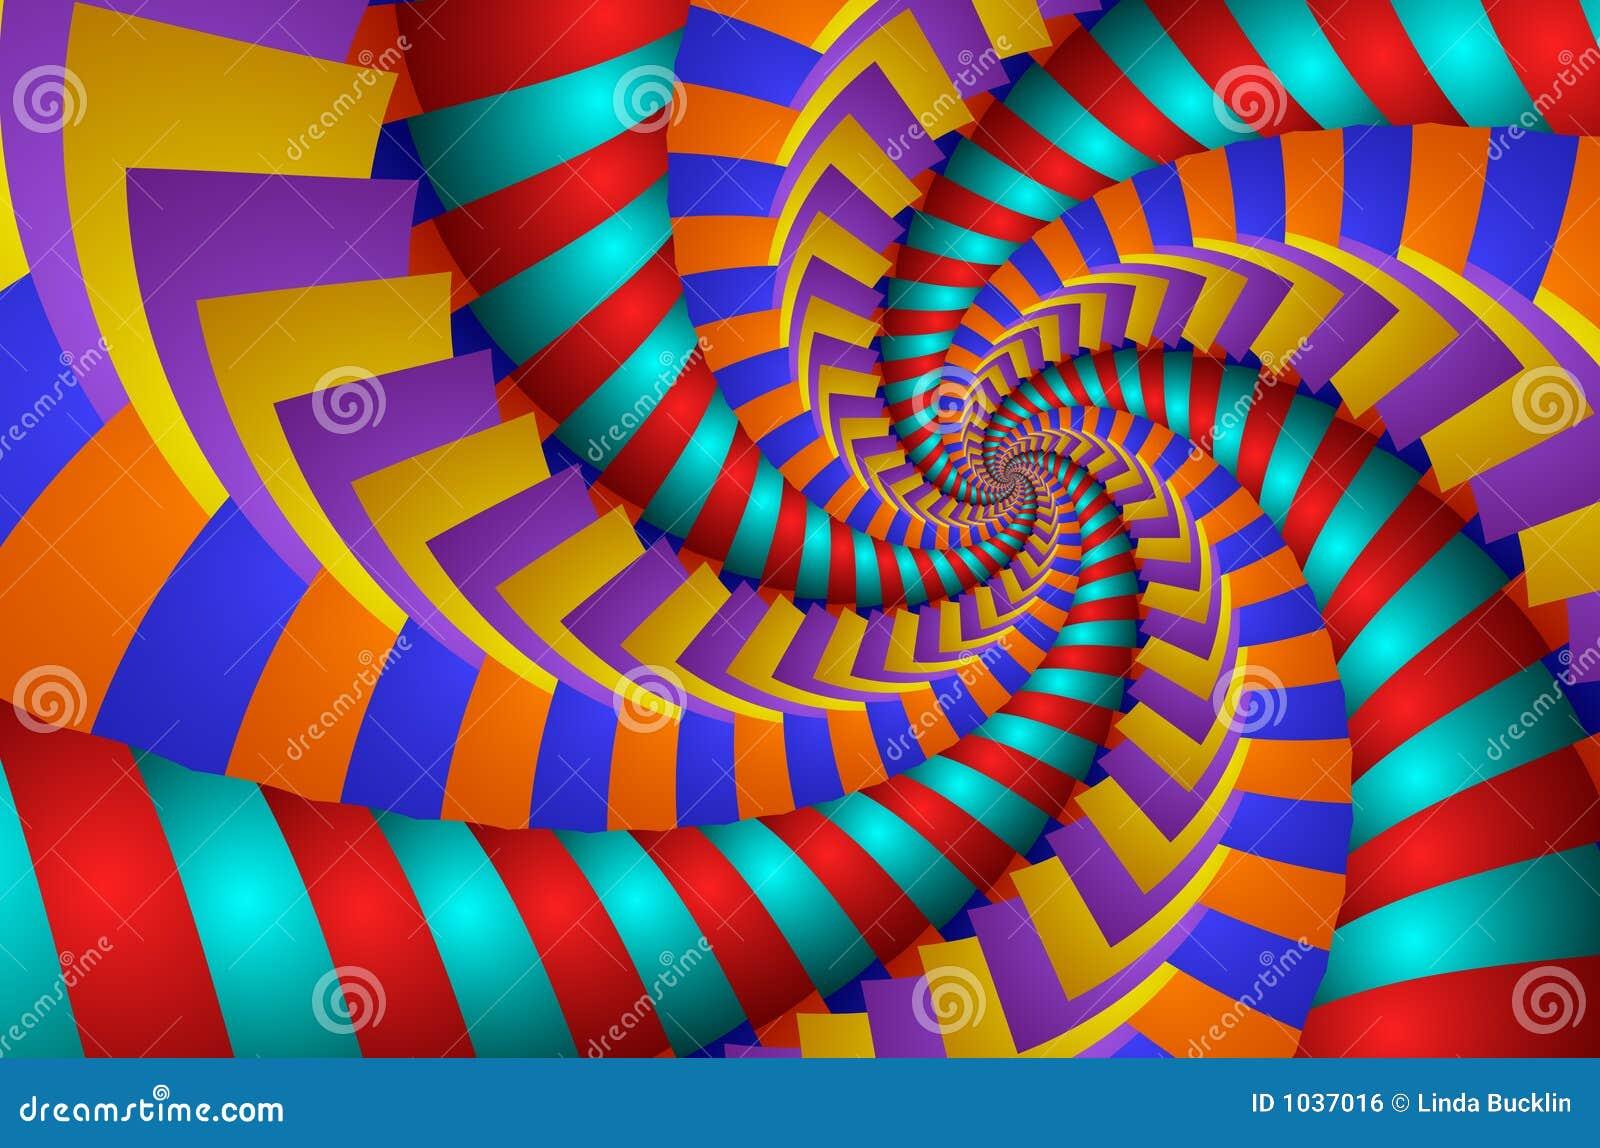 Colorful Spin - fractal image